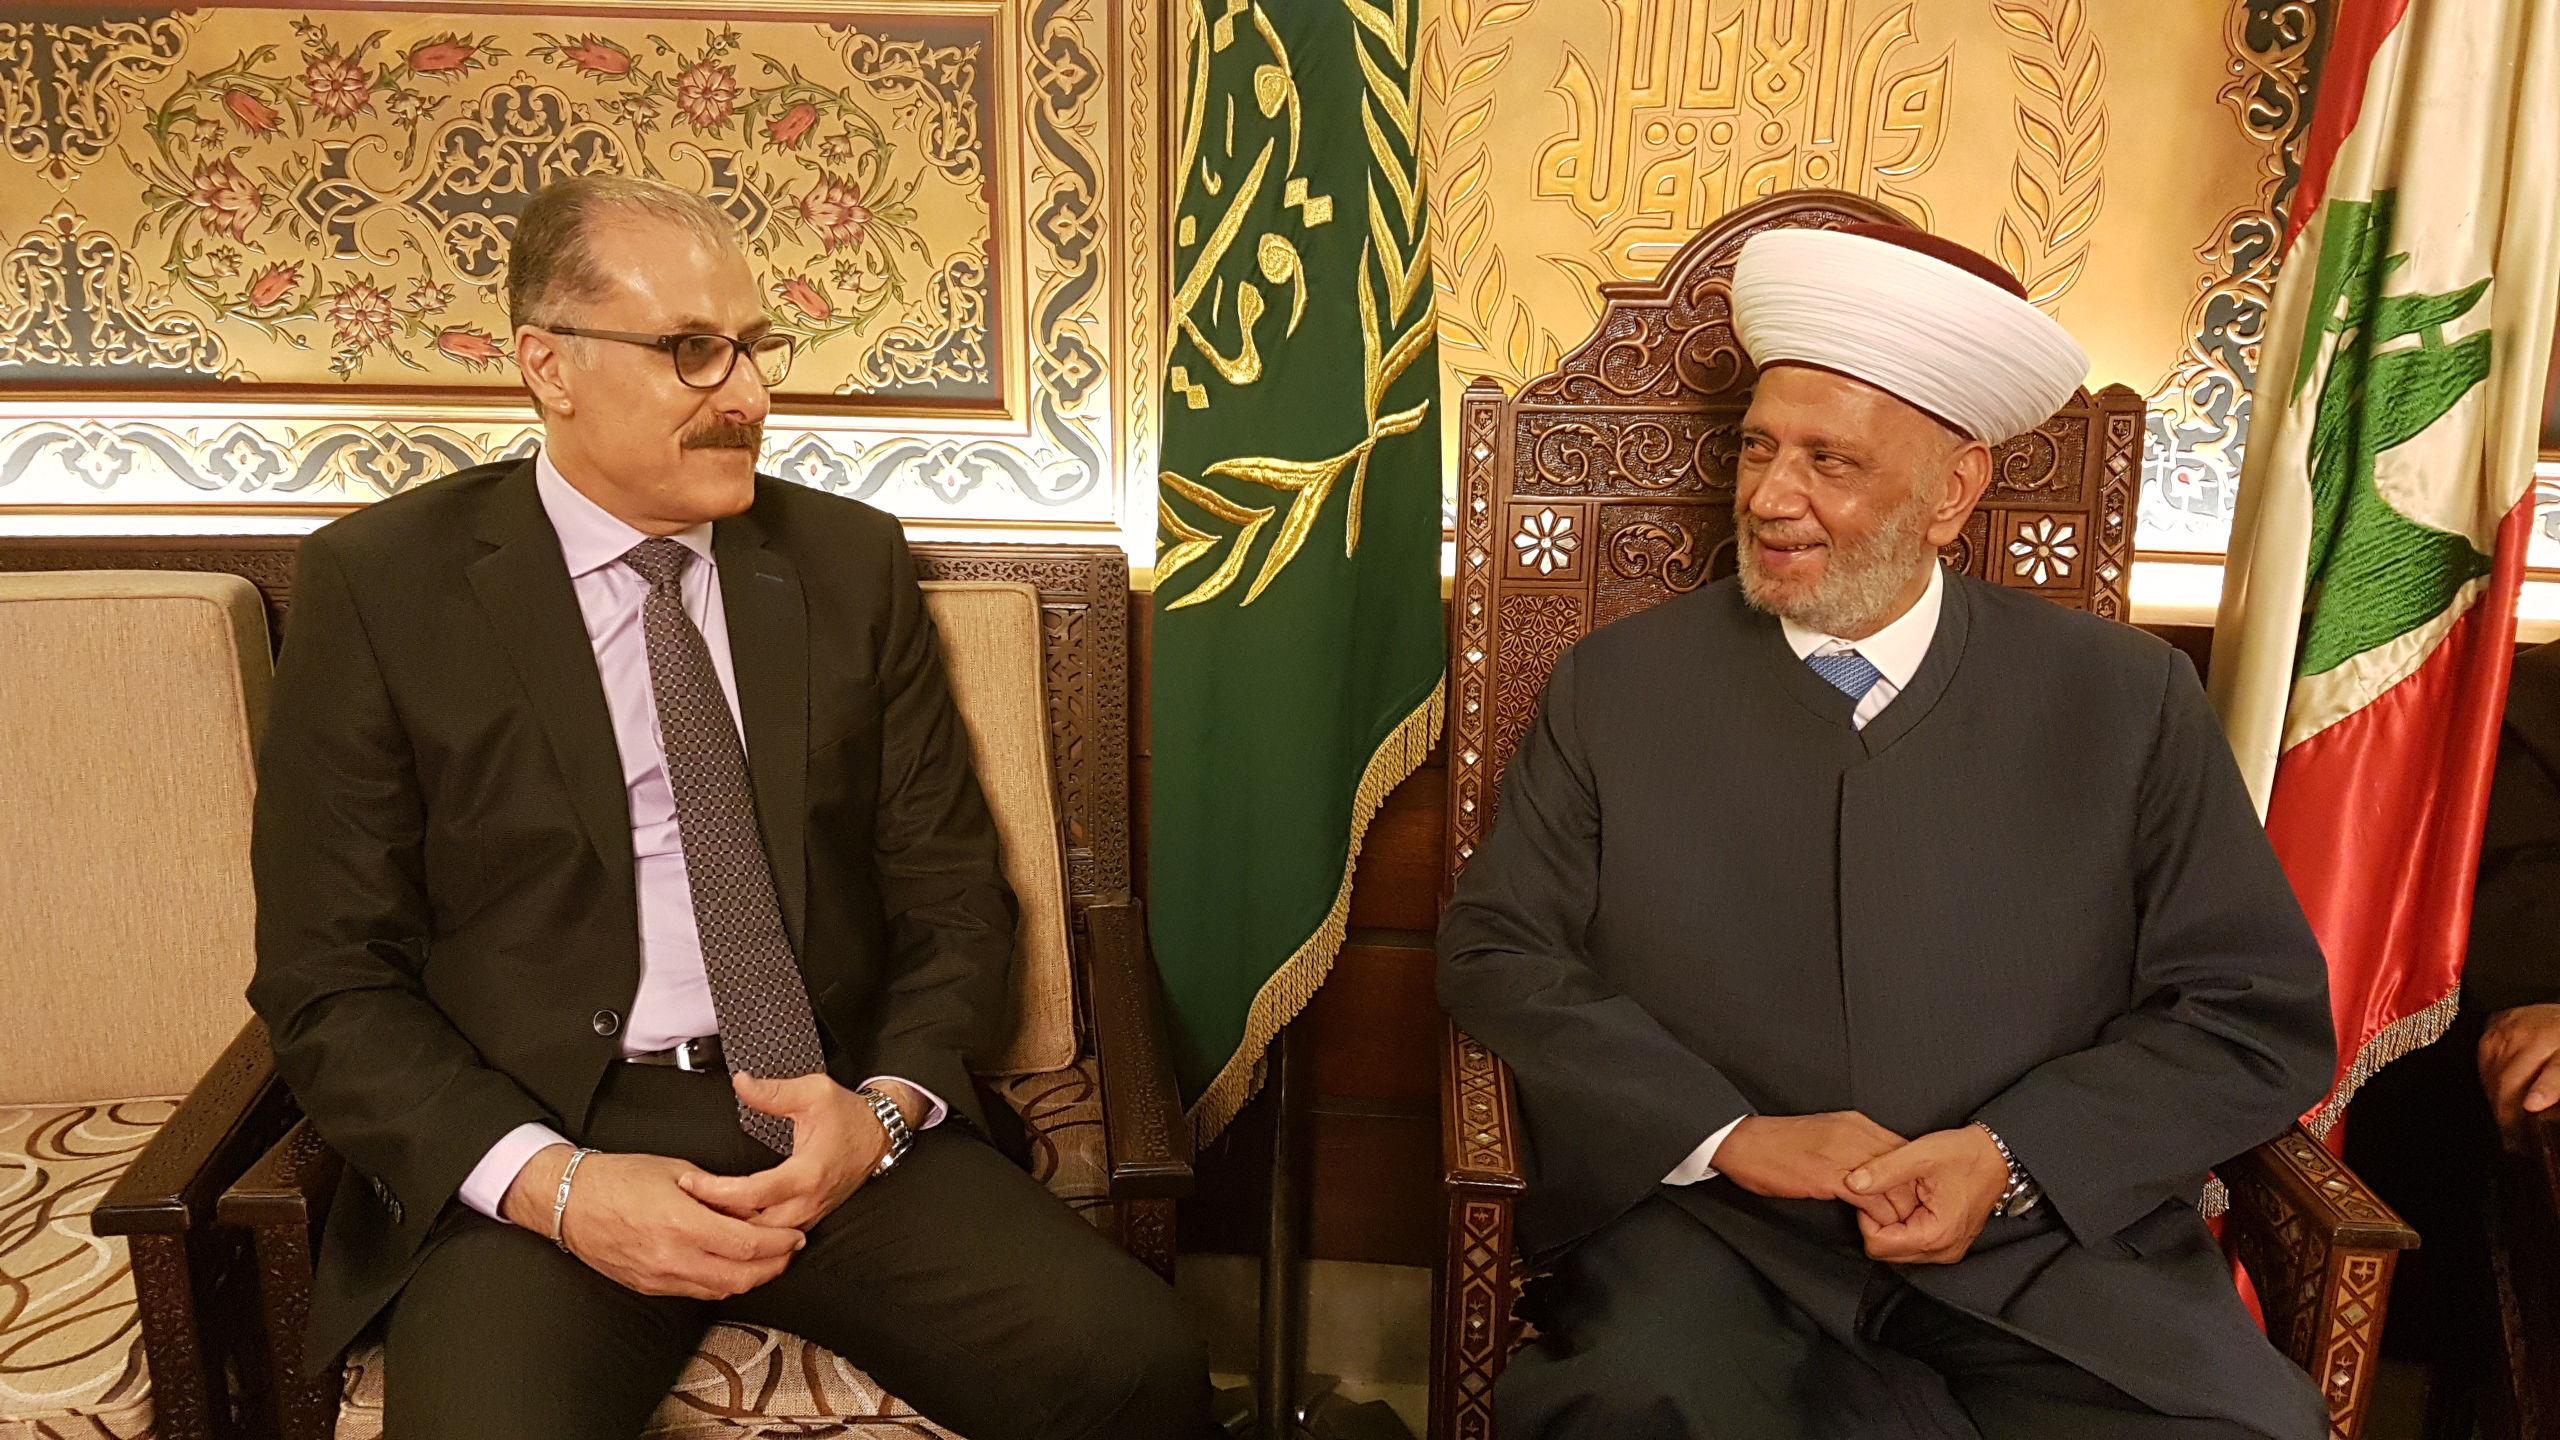 MP BILAL ABDALLAH